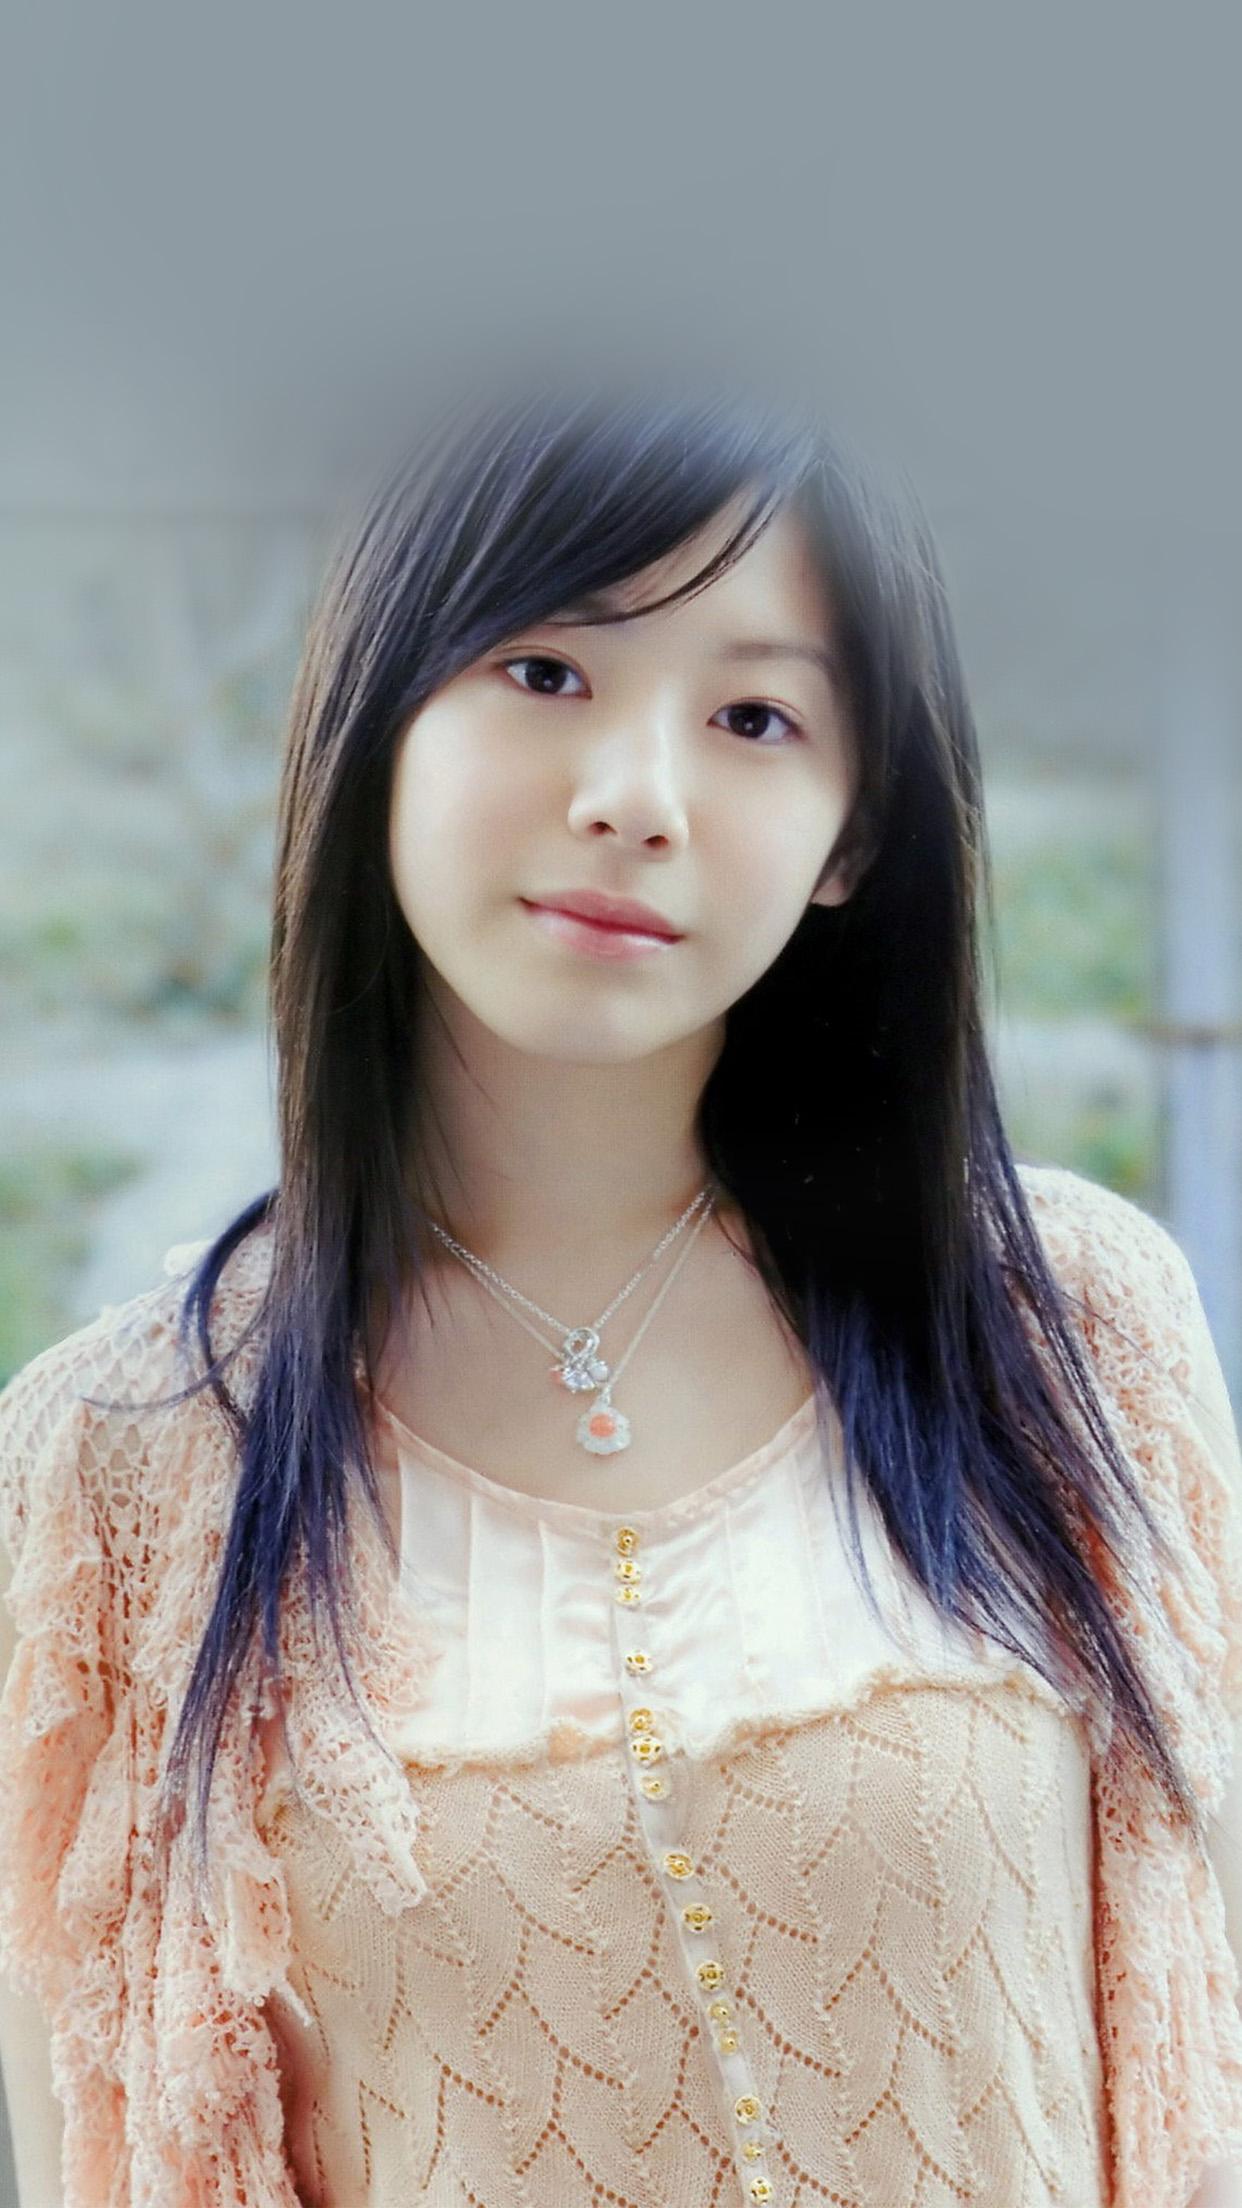 Anime Girl Wallpapers Phone Hj07 Kaho Japanese Girl Actress Wallpaper